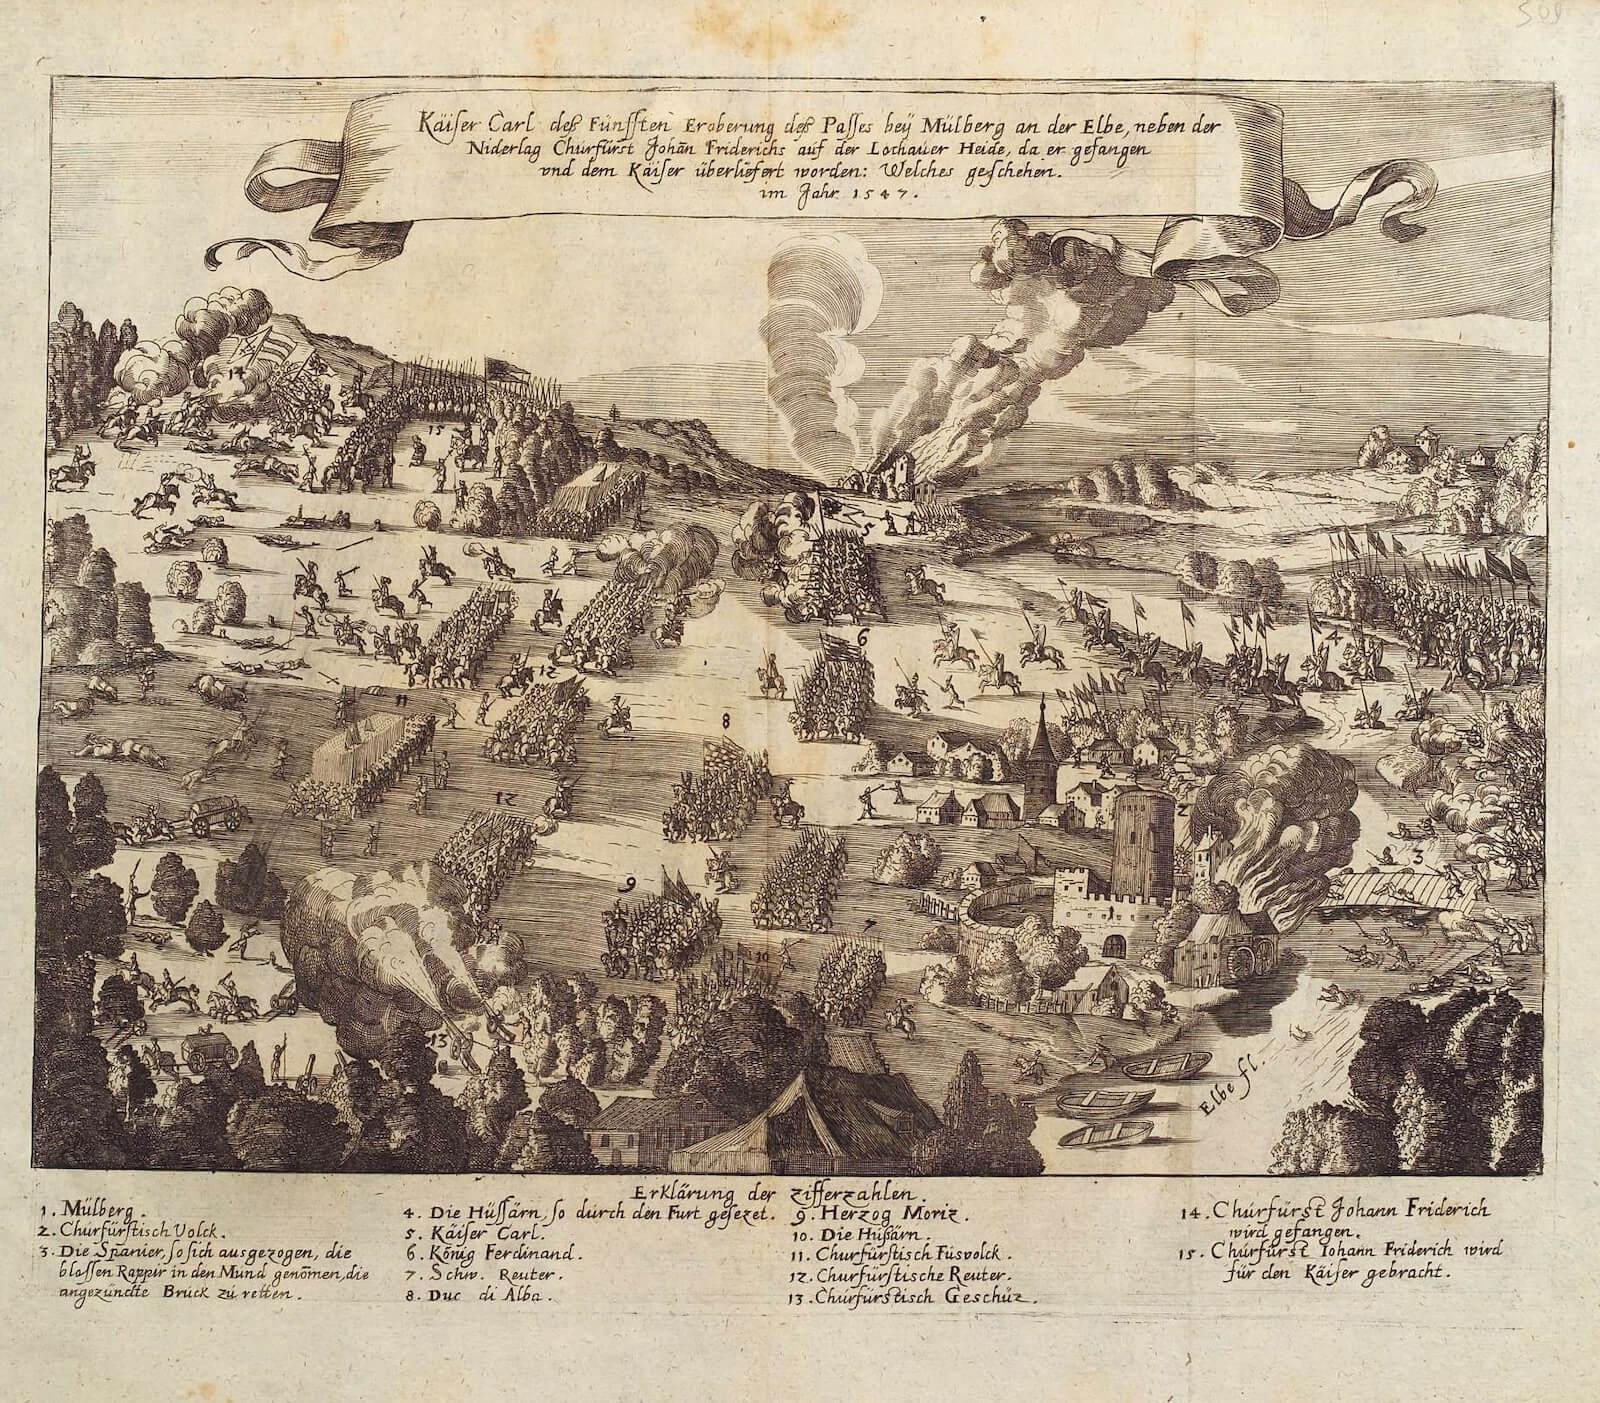 batalla de Mühlberg battle of Mühlberg 1547